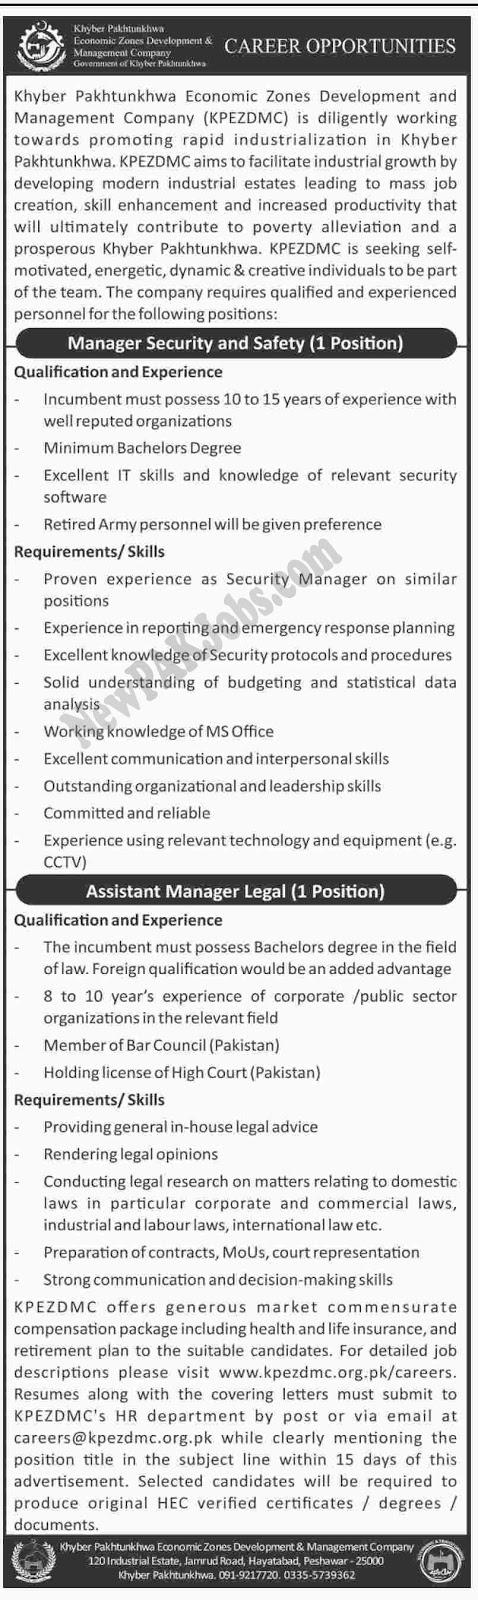 Khyber Pakhtunkhwa Economic Zones Development And Management Company, Latest Job